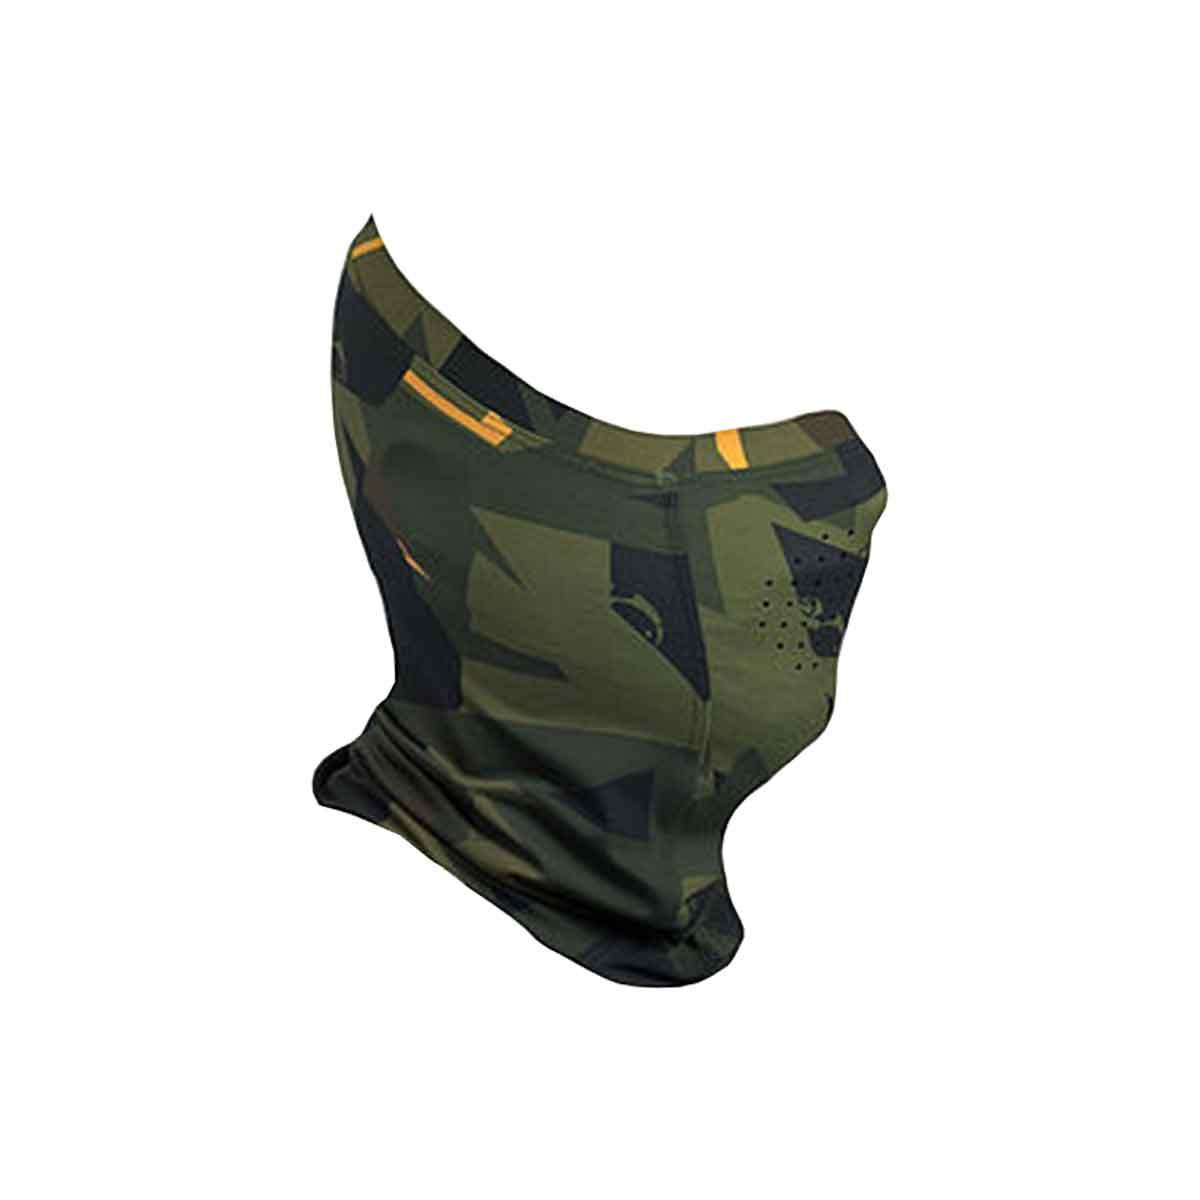 Máscara de Proteção Solar Faca na Rede Ice Mask Jungle